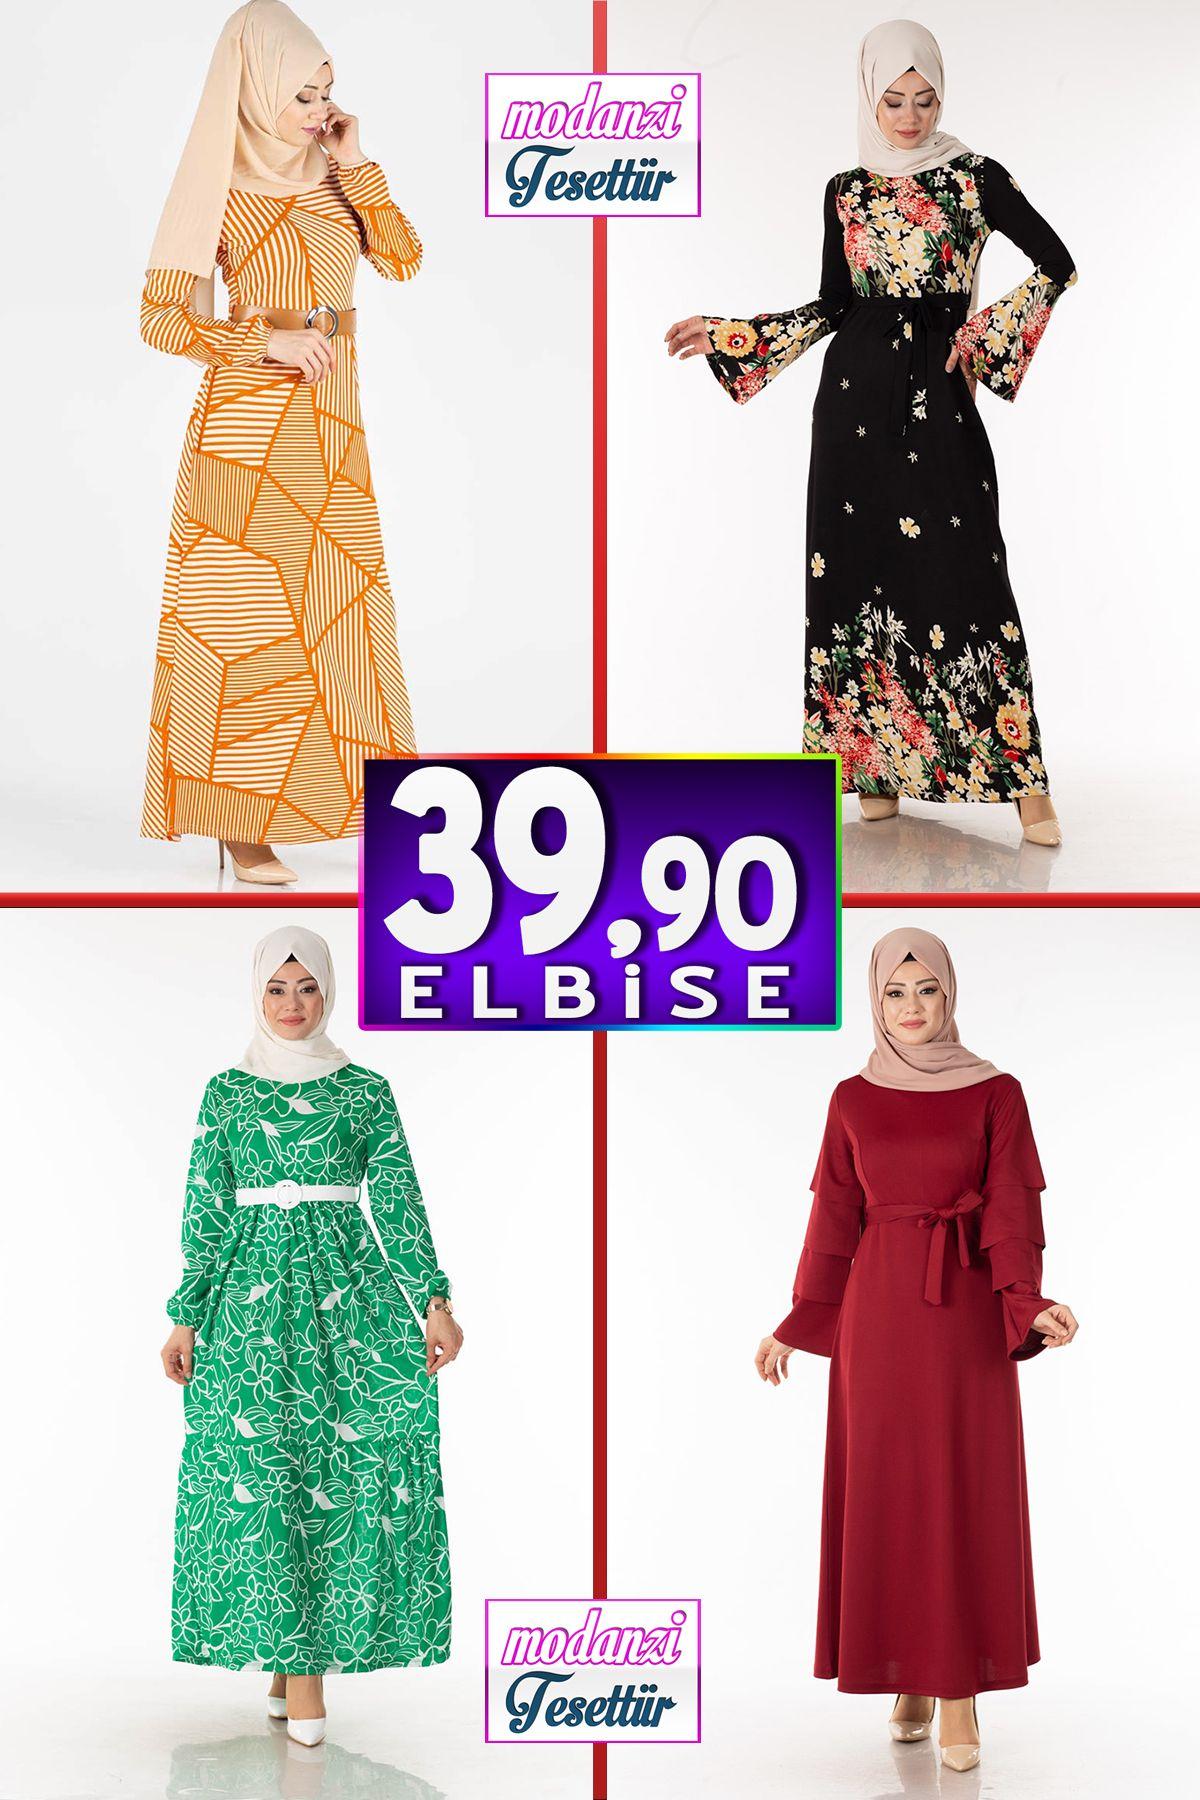 Tesettur Pazari 39 90 Tl Elbise Modelleri 4 Kampanya Indirim Tesettur Elbise Modelleri 2020 Elbise Moda Stilleri Elbise Modelleri